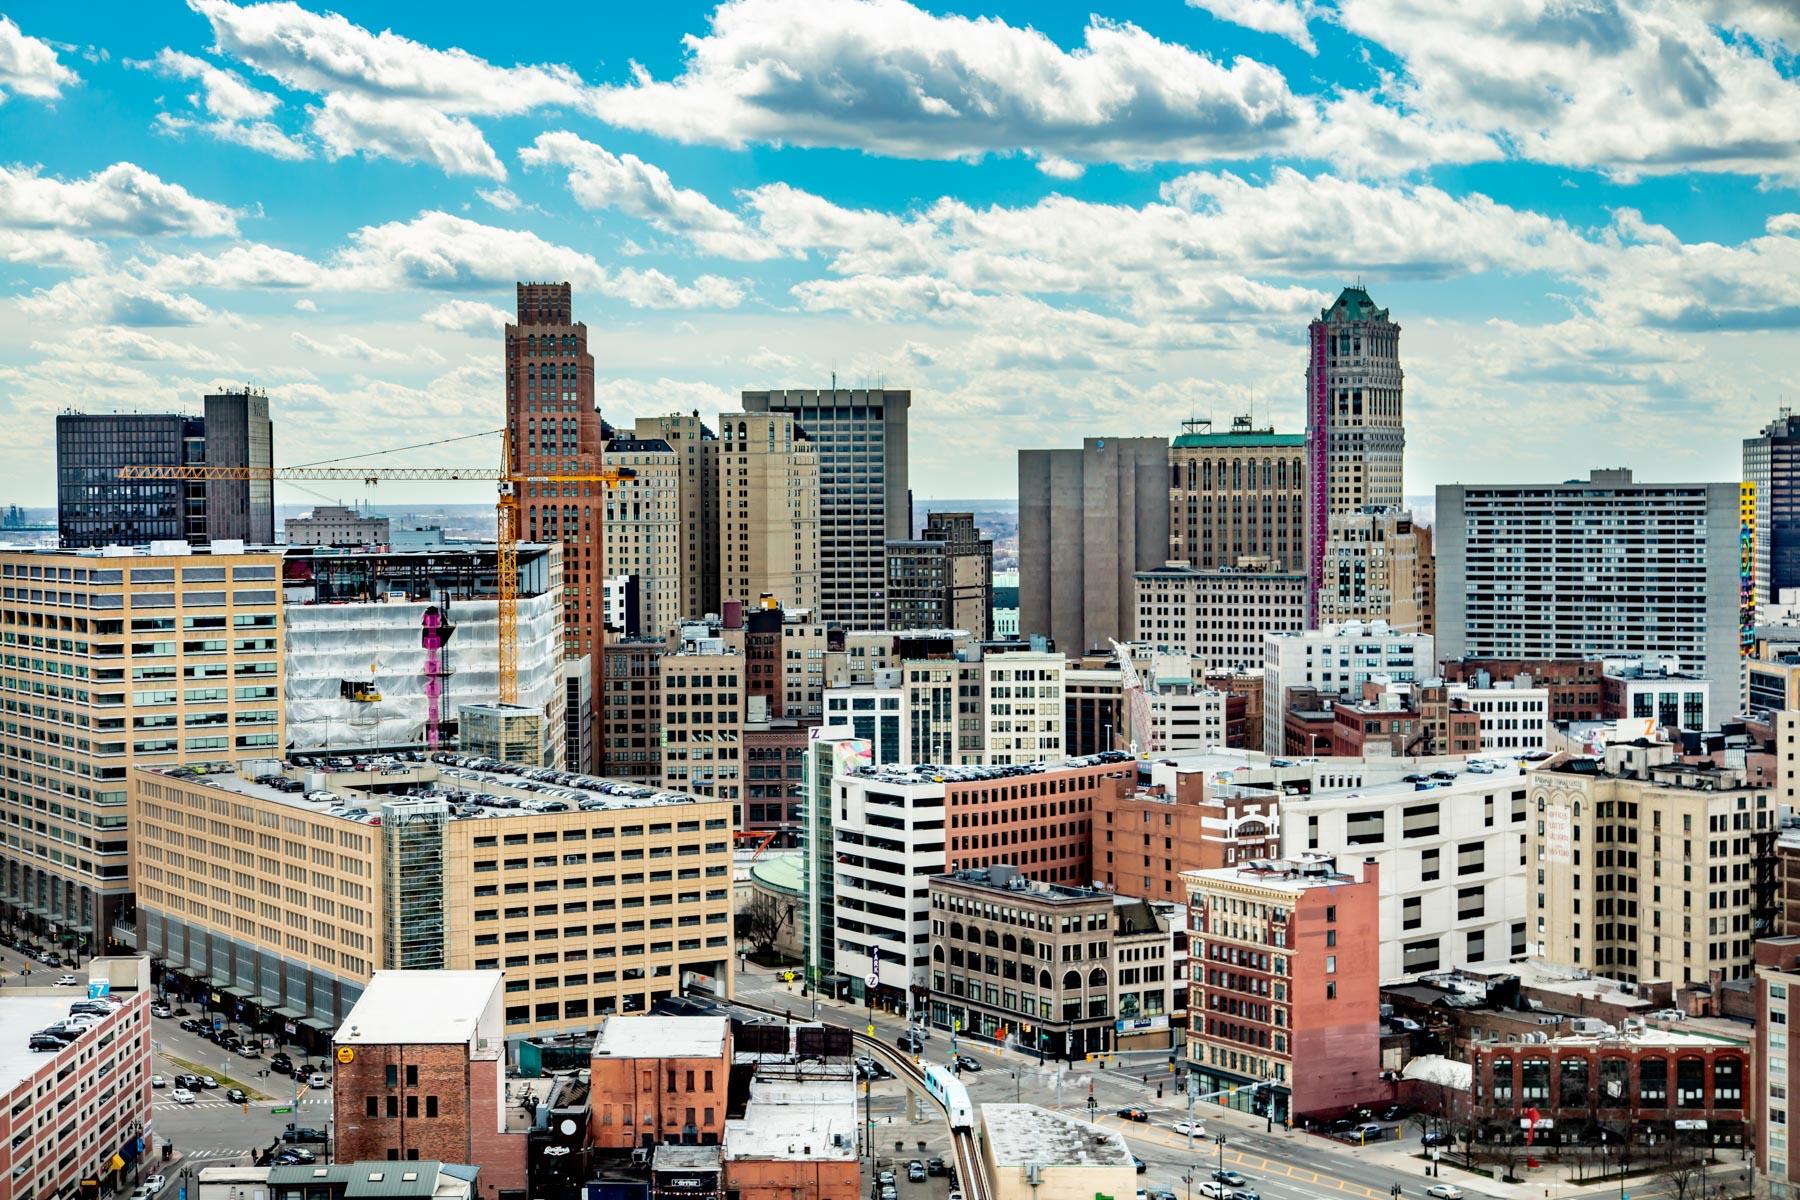 City pics GtCH Rooftop - 1z3a7261